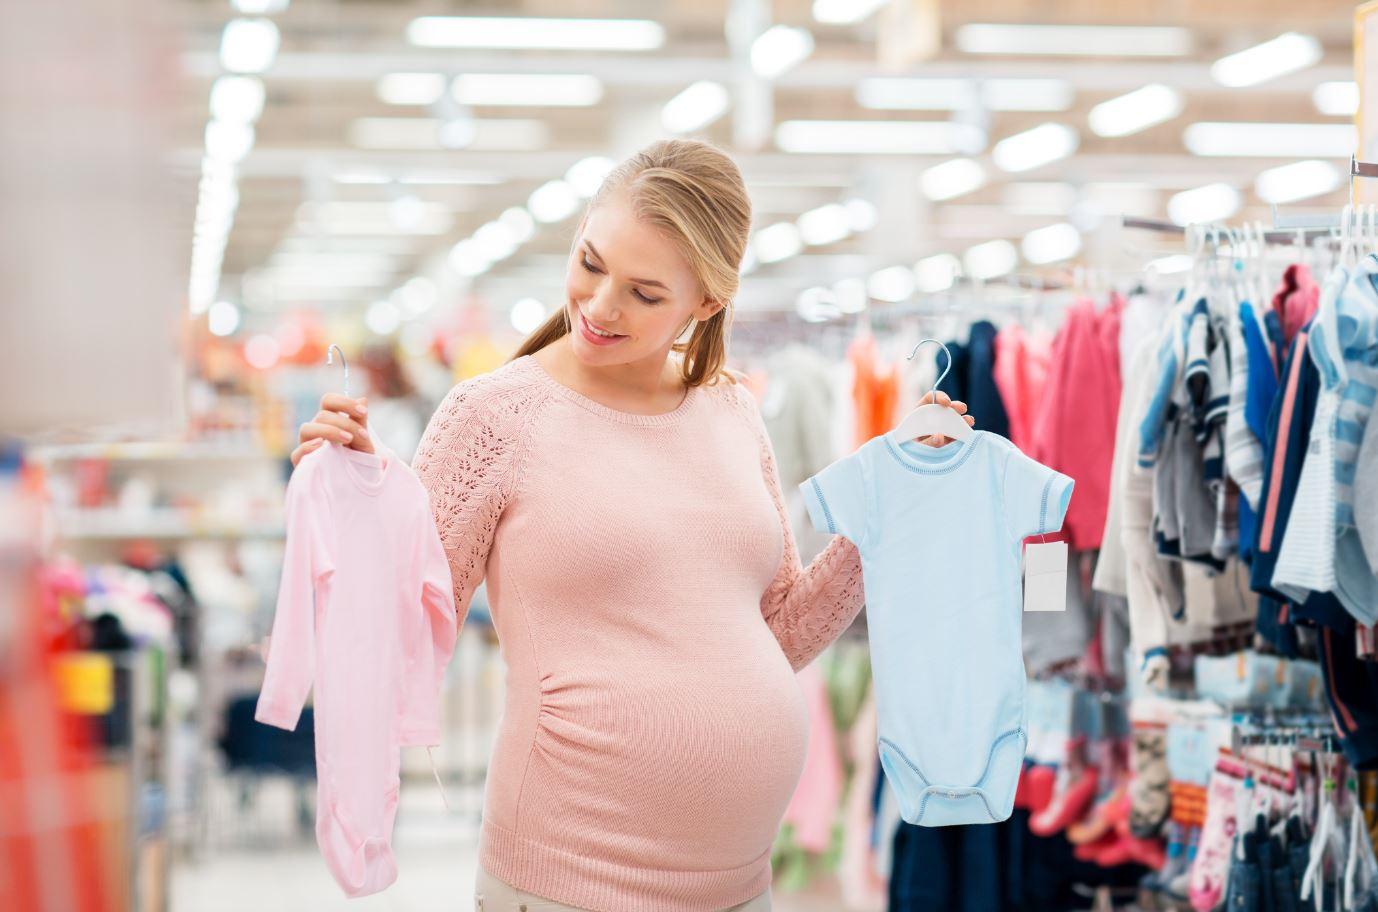 Schwanger Frau shoppt Babykleidung Adobe Stockphotos